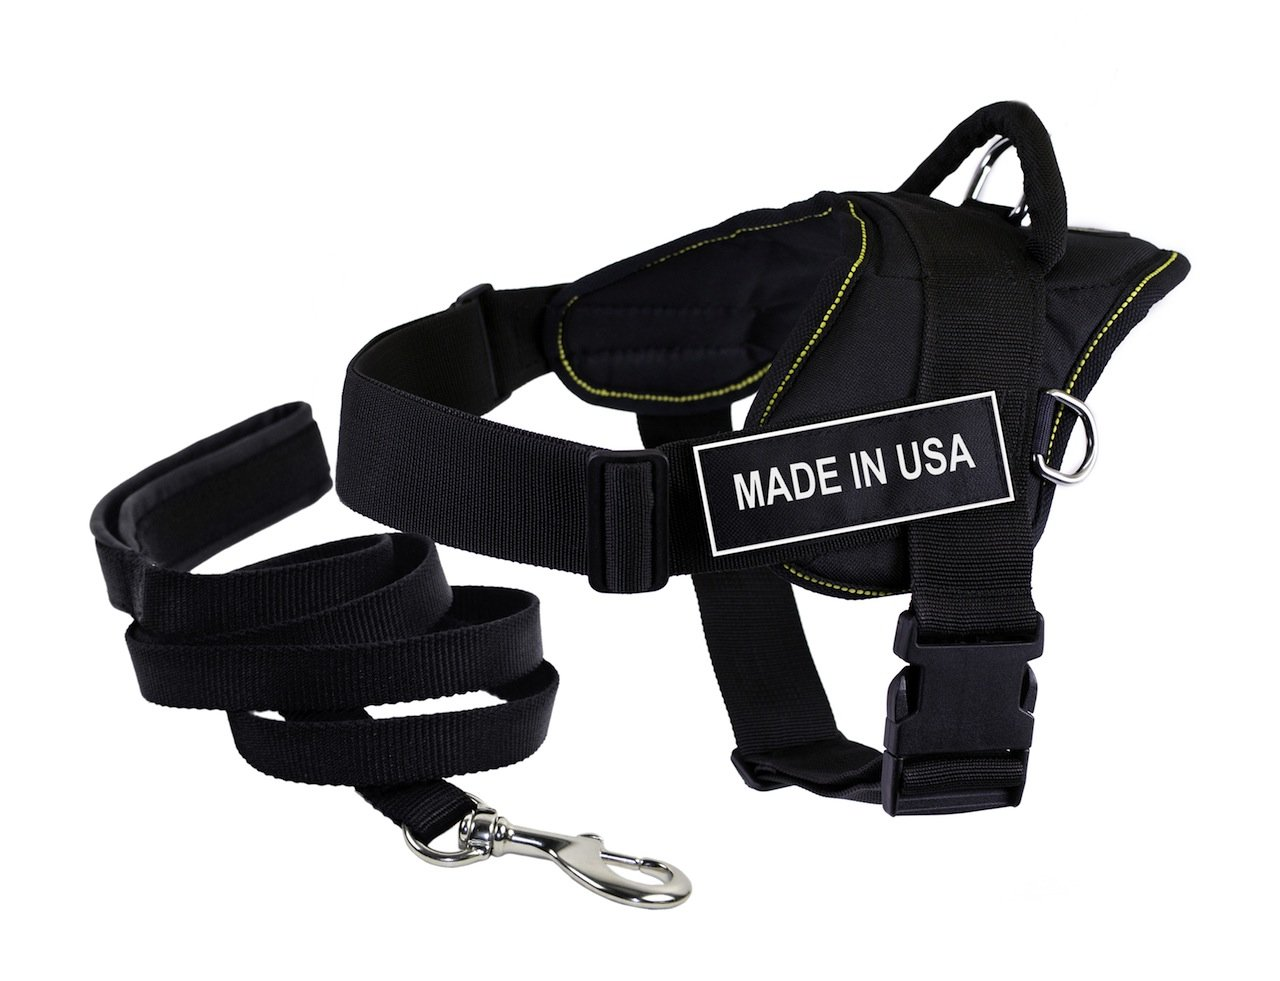 Dean & Tyler DT Fun Harness Made in USA, Misura Media, con 1,8 m Padded Puppy guinzaglio.